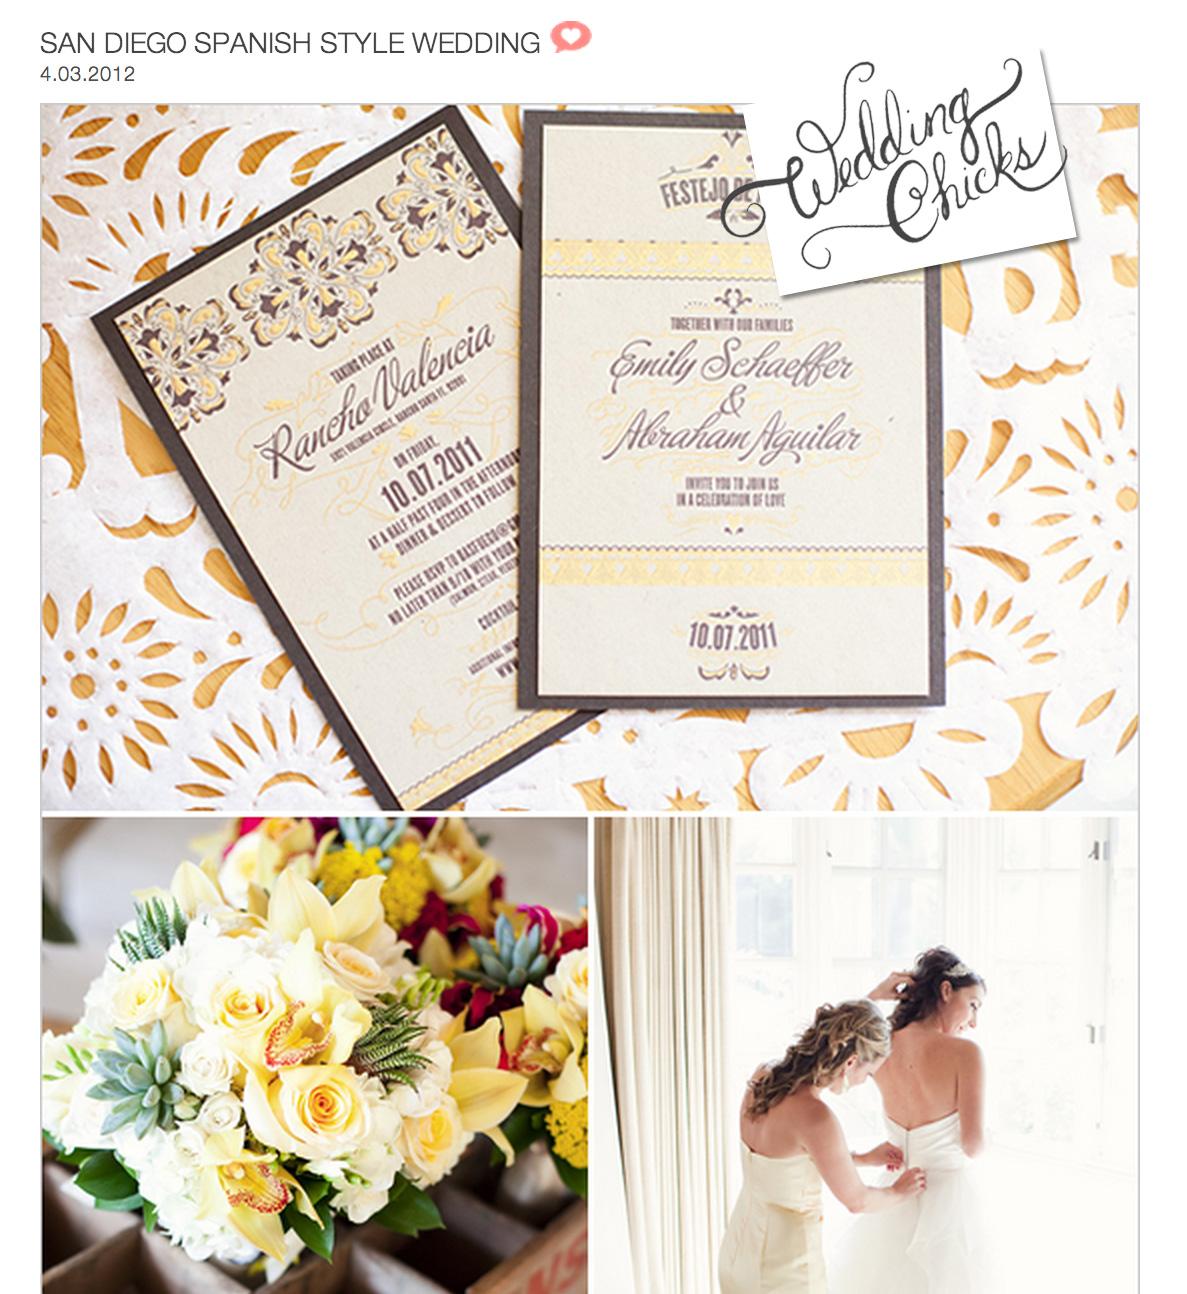 WeddingChicks Spanish.jpg